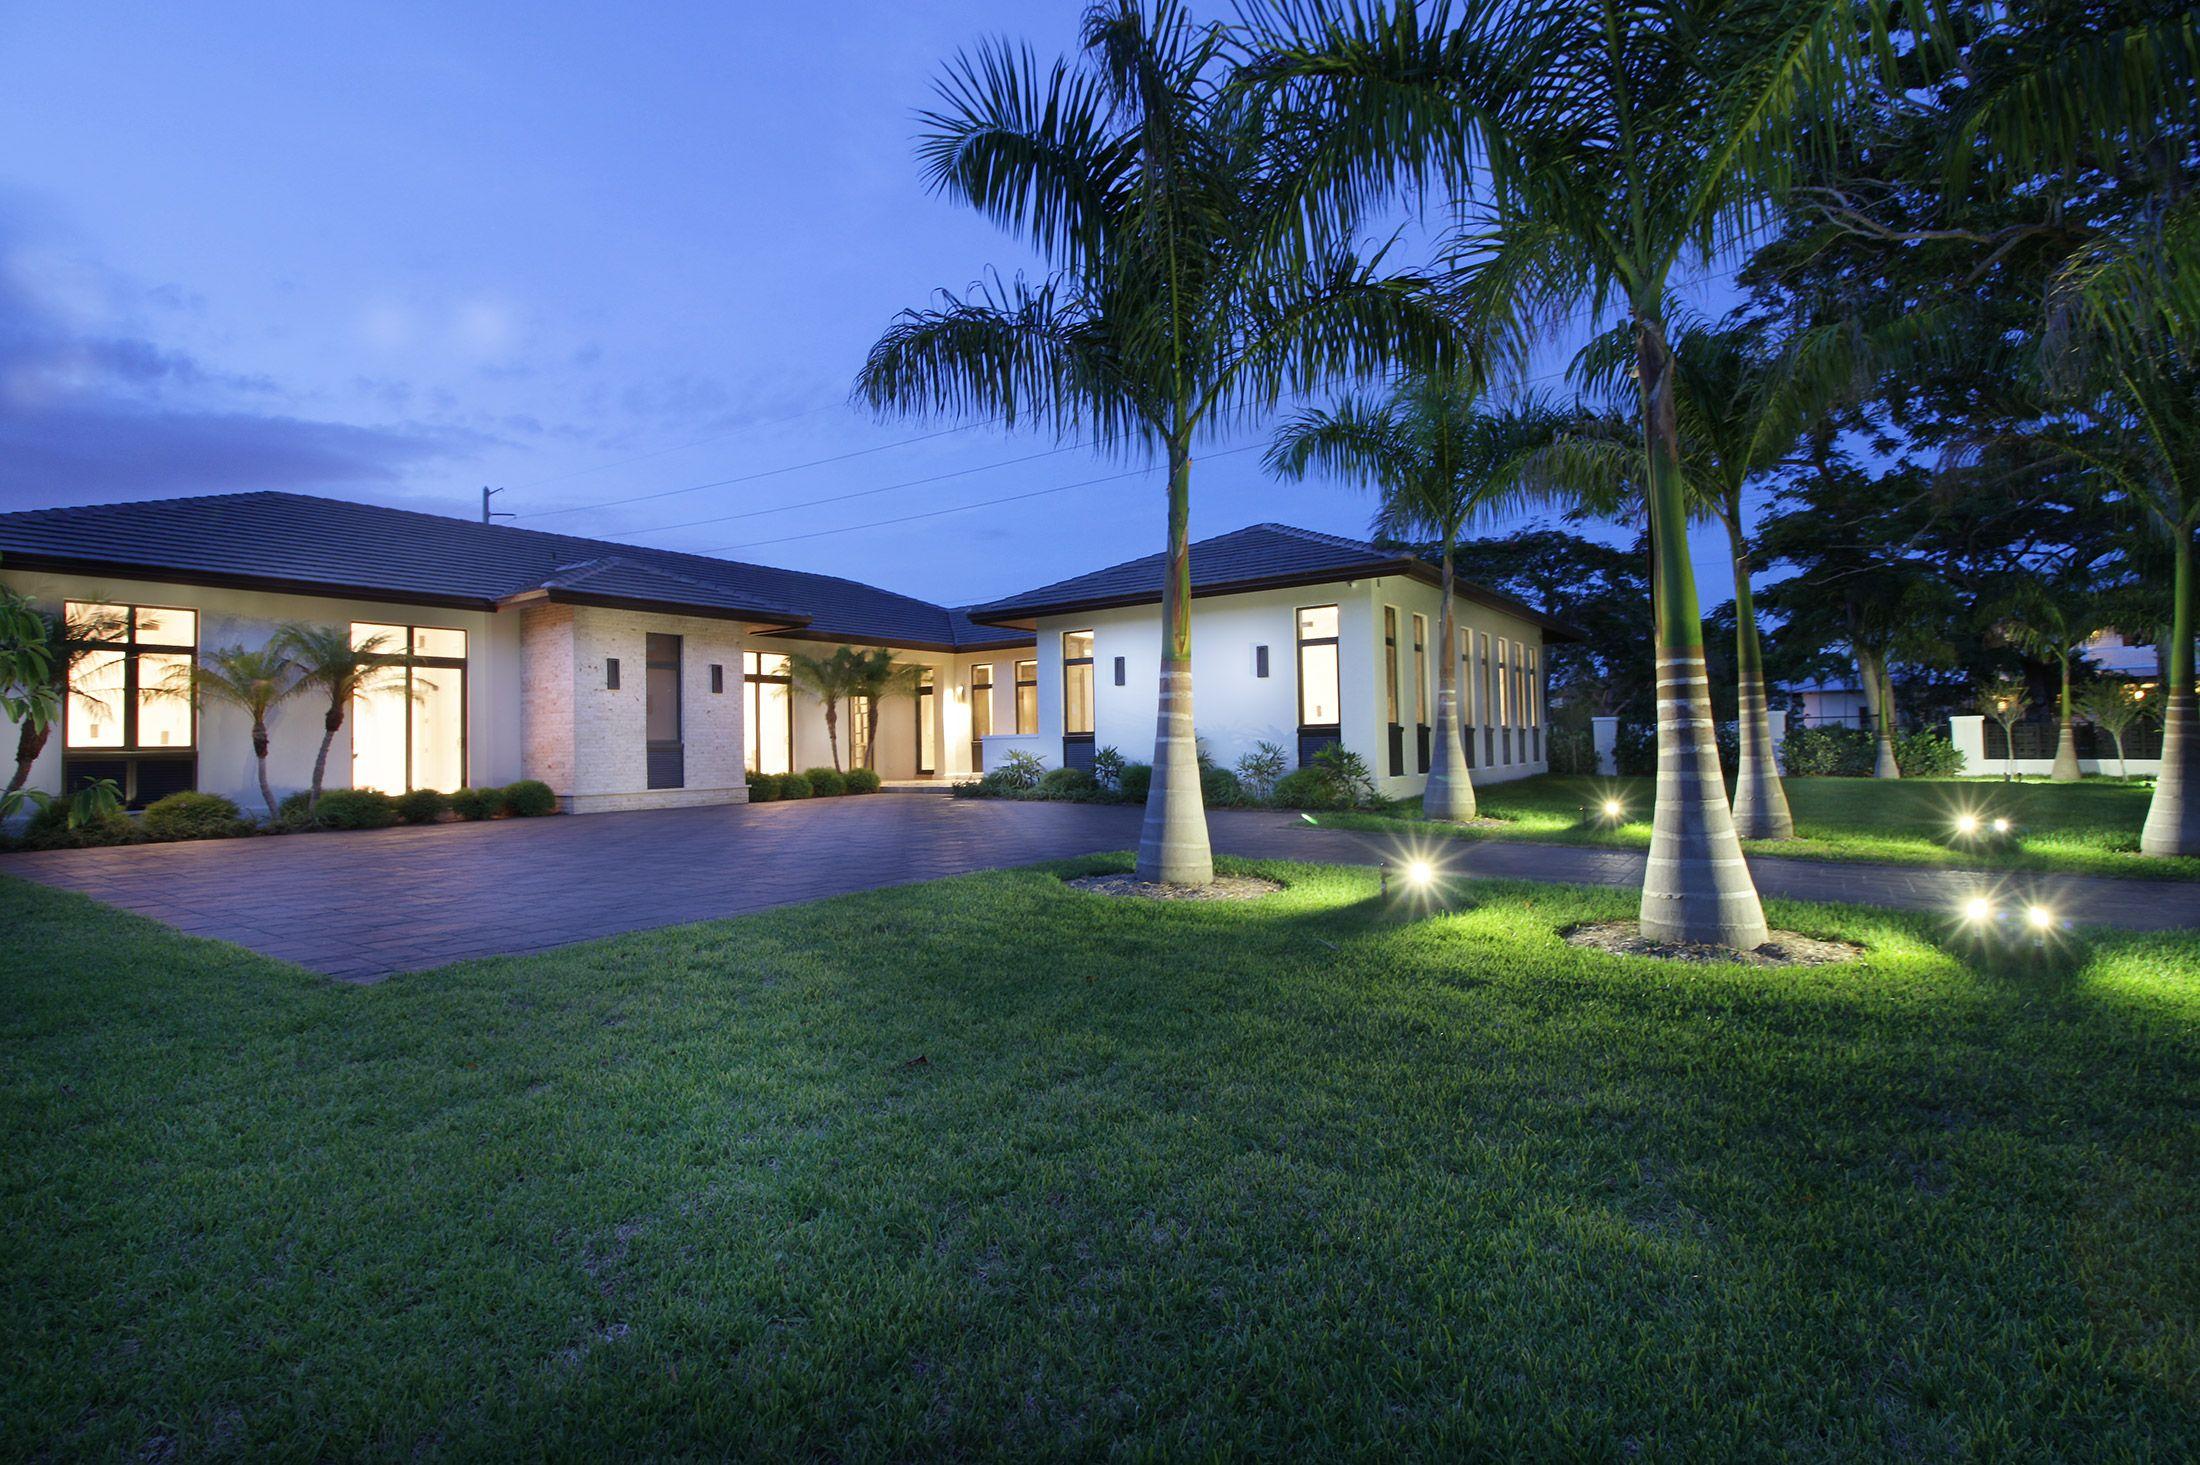 Landscape Lighting Twilight Exterior Photography Impact Windows Transitional Home Facade